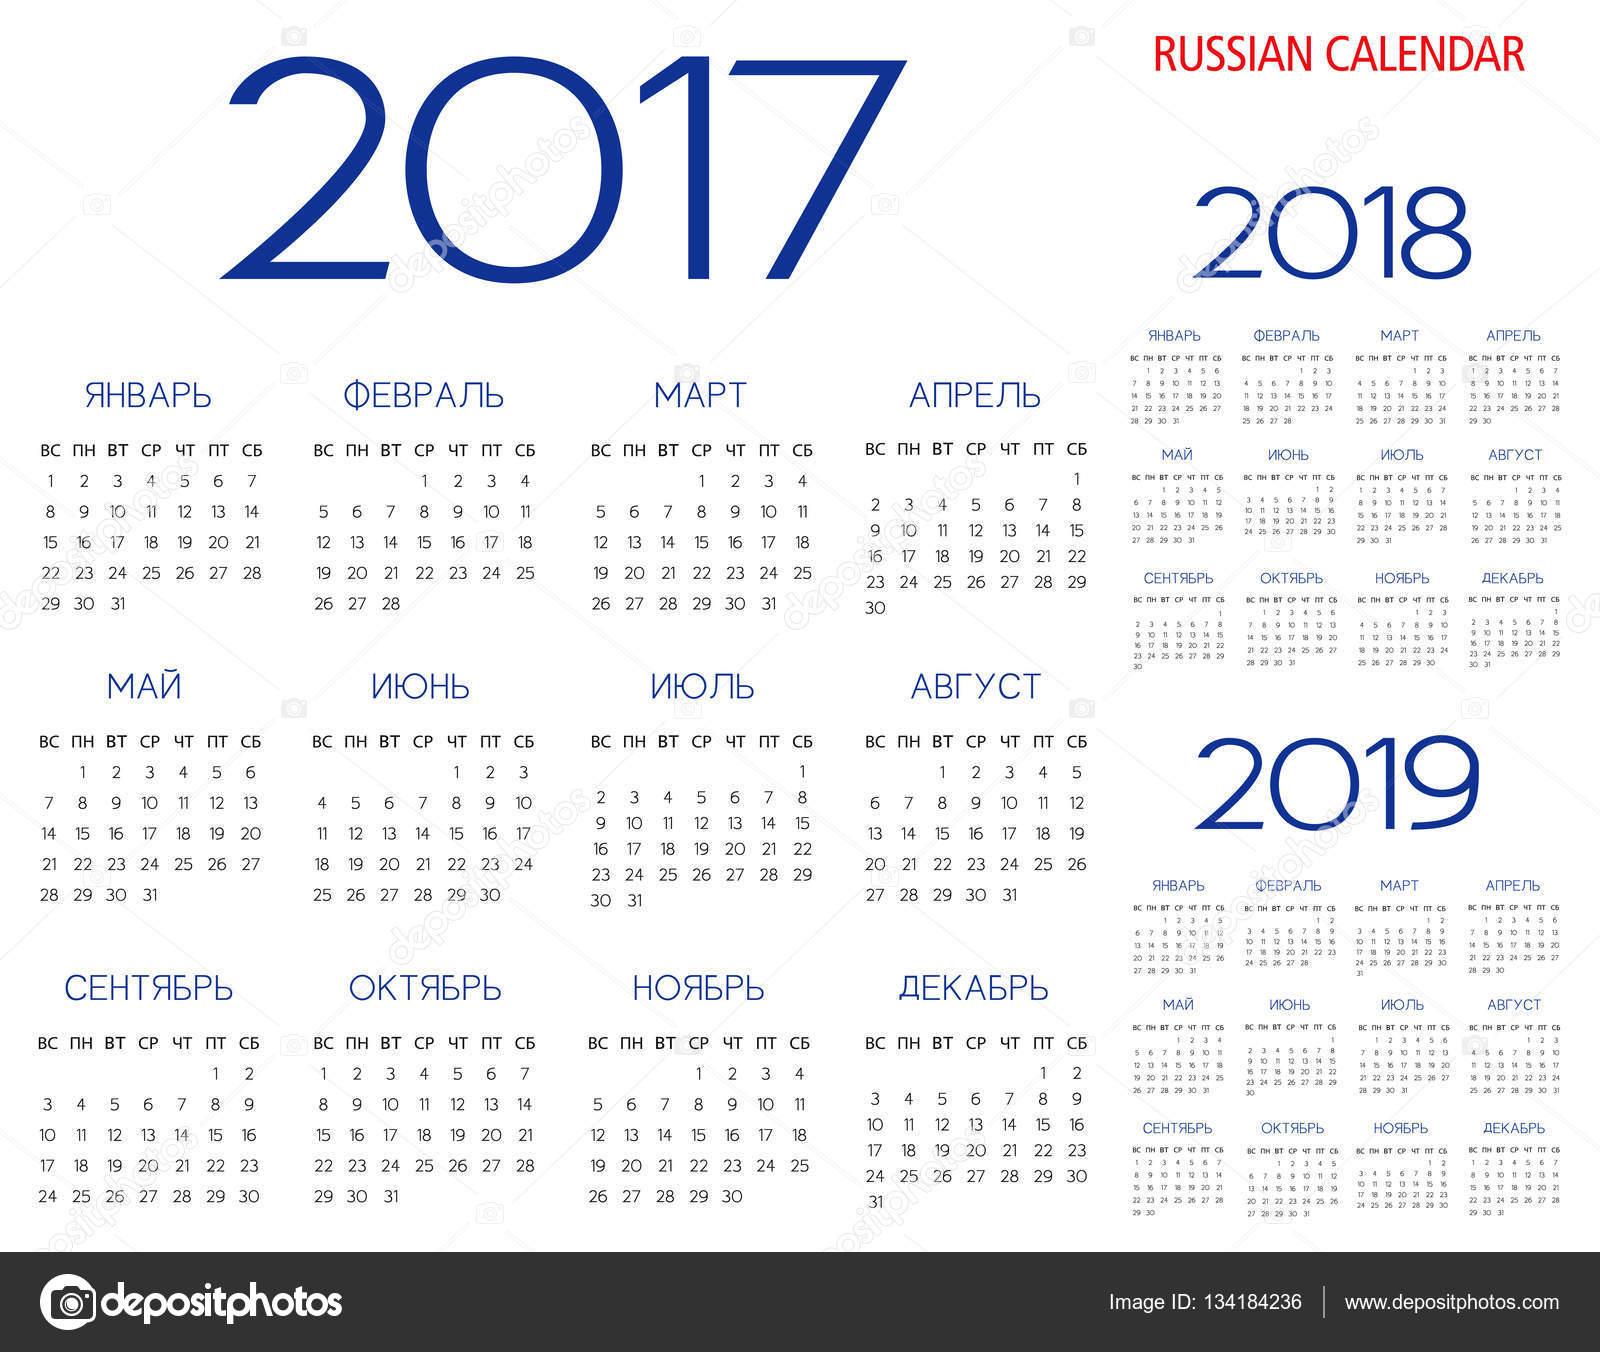 2017 2018 2019 Ford Price: Вектор: календари. Русский календарь 2017-2018-2019 вектор